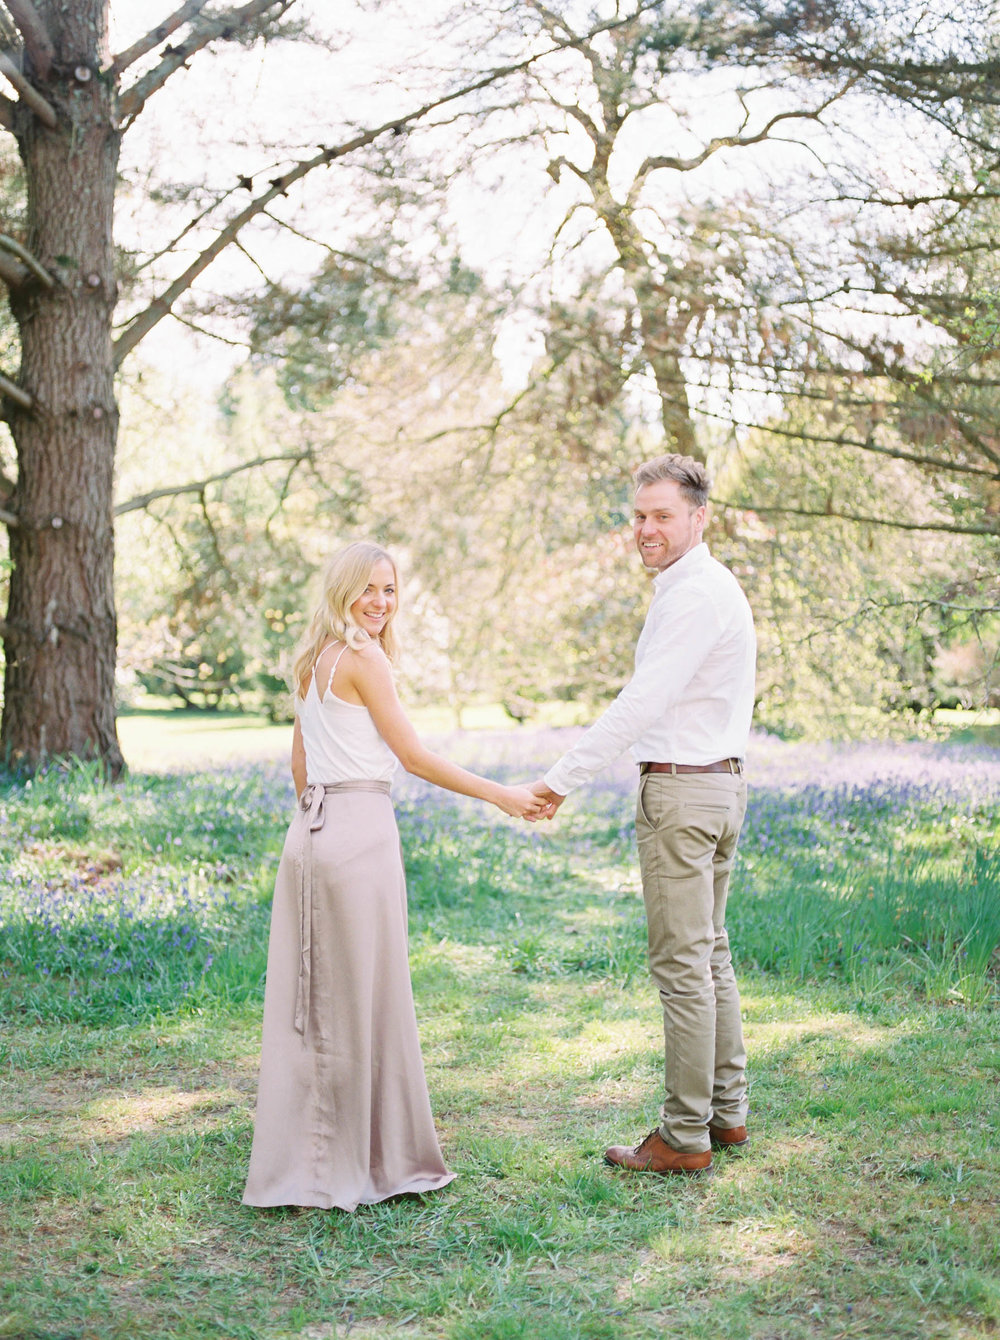 Amy O'Boyle Photography- Destination & UK Fine Art Film Wedding Photographer- Sheffield Park Garden National Trust Spring Engagement Shoot-3.jpg